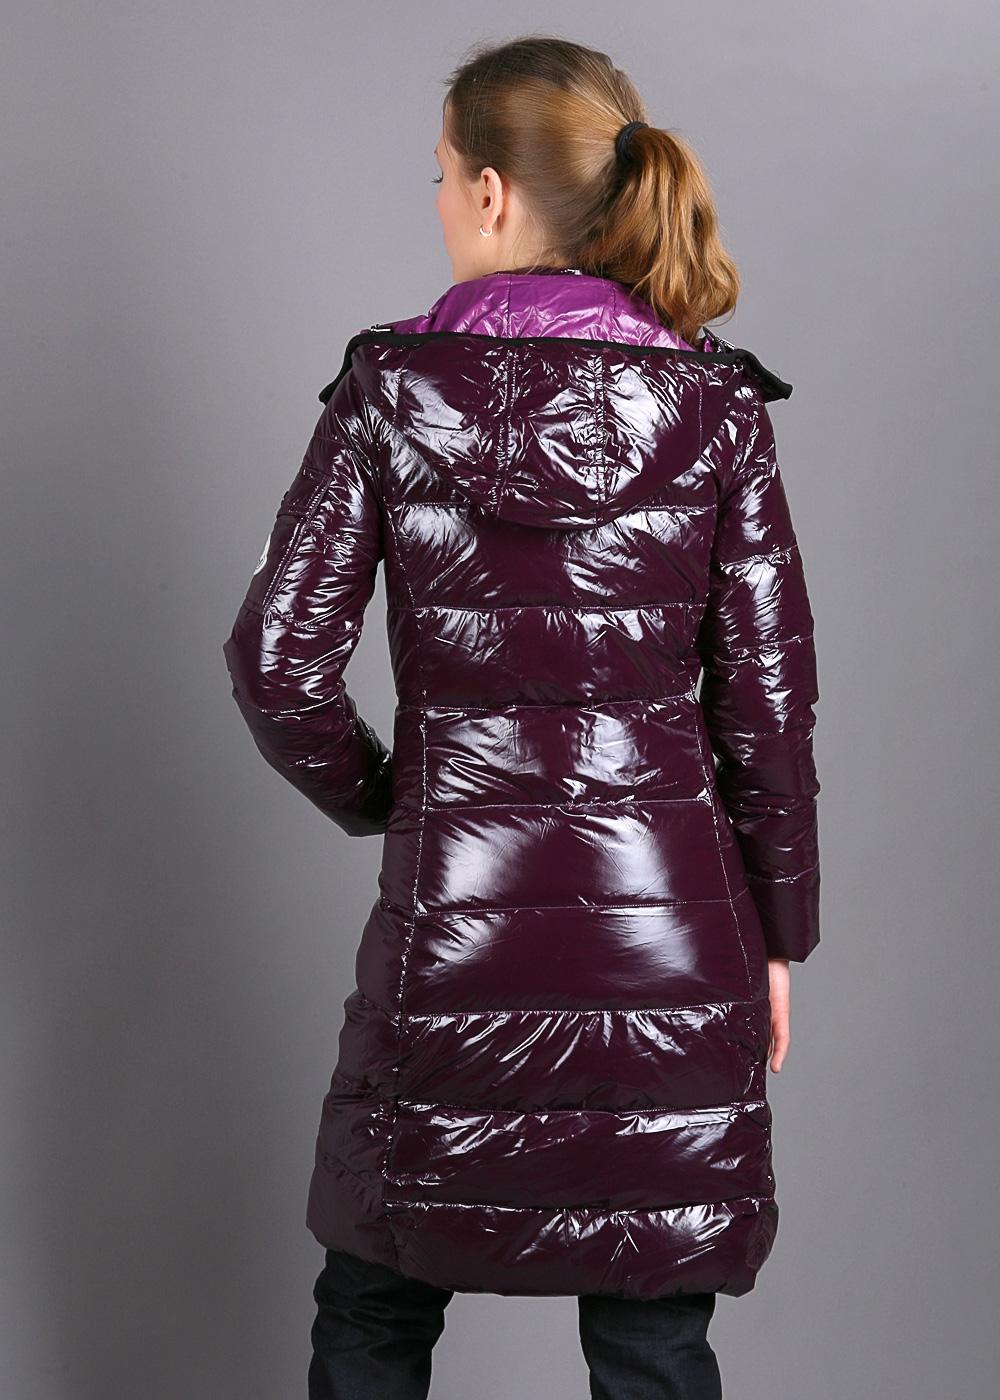 40b12a505 Burgundy Moncler down coat | SHINY NYLON